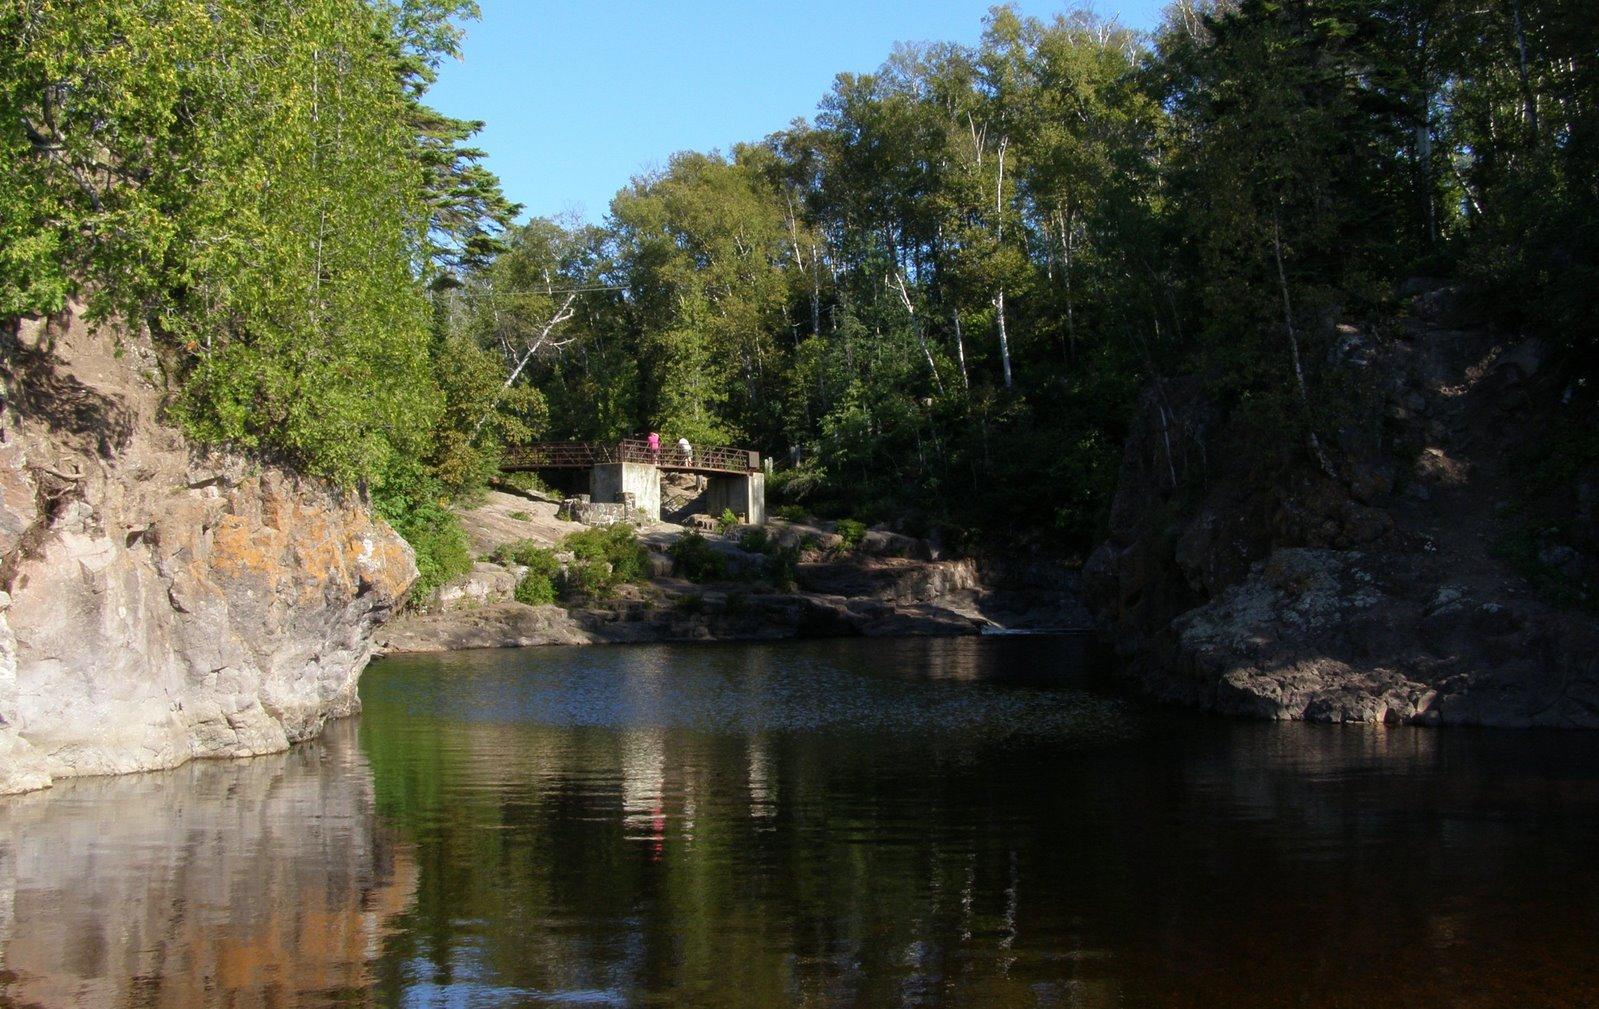 temperance river state park, minnesota